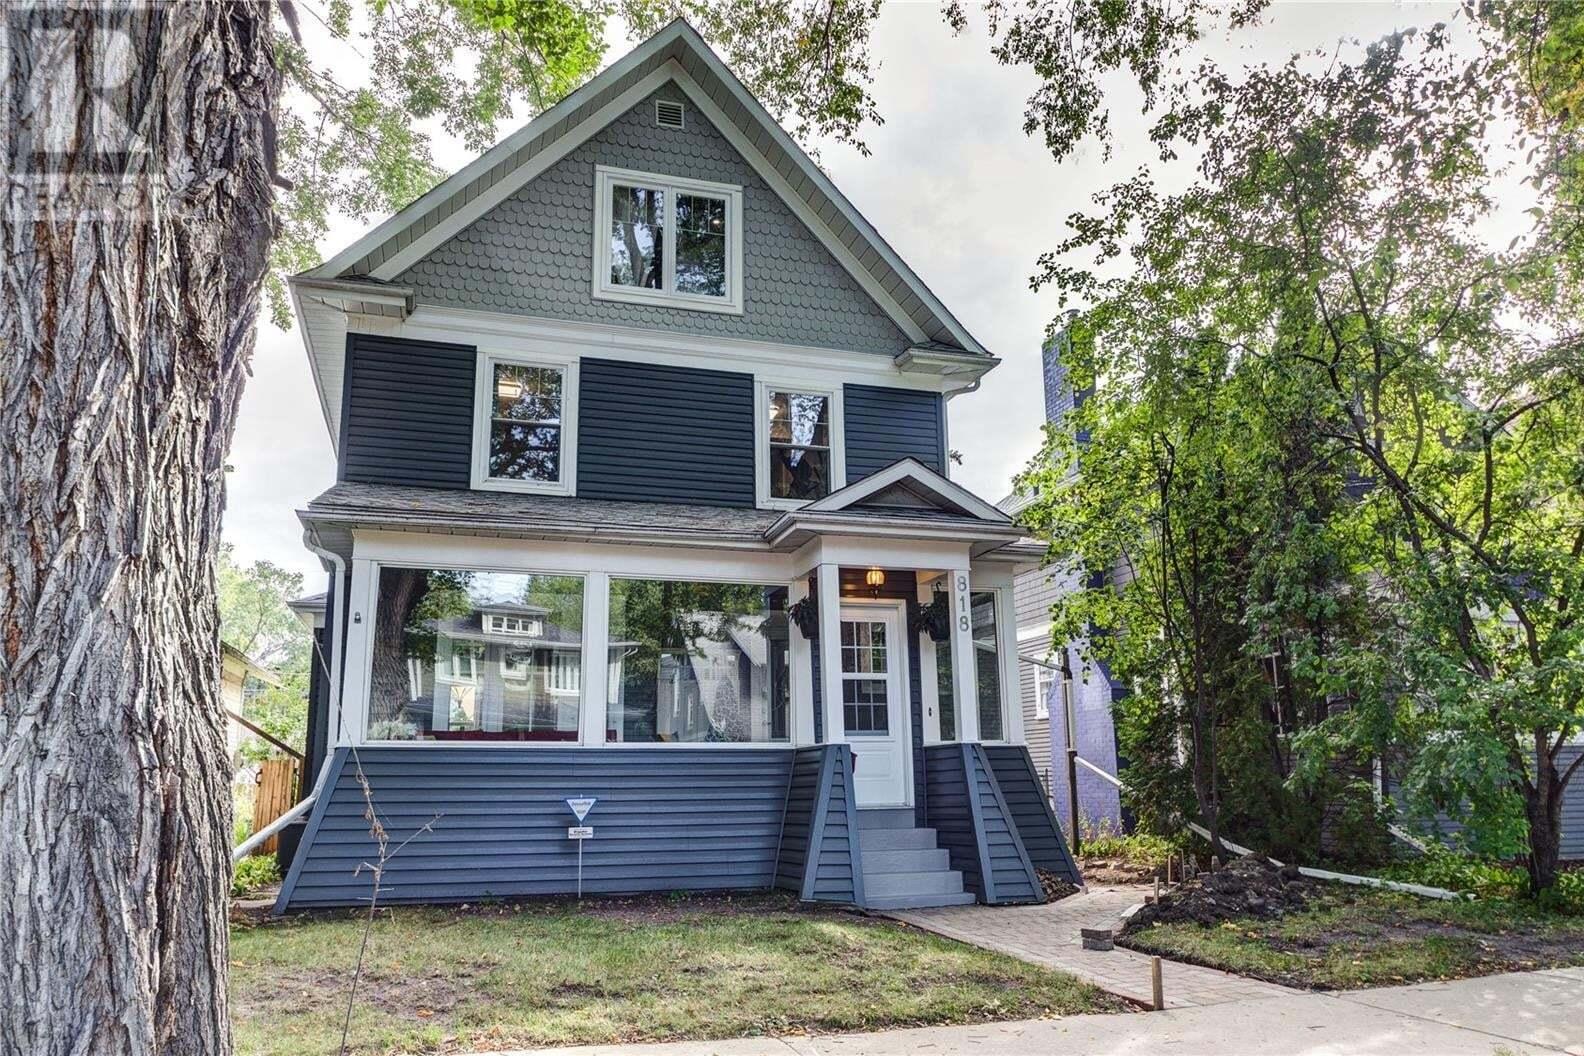 House for sale at 818 13th St E Saskatoon Saskatchewan - MLS: SK826857